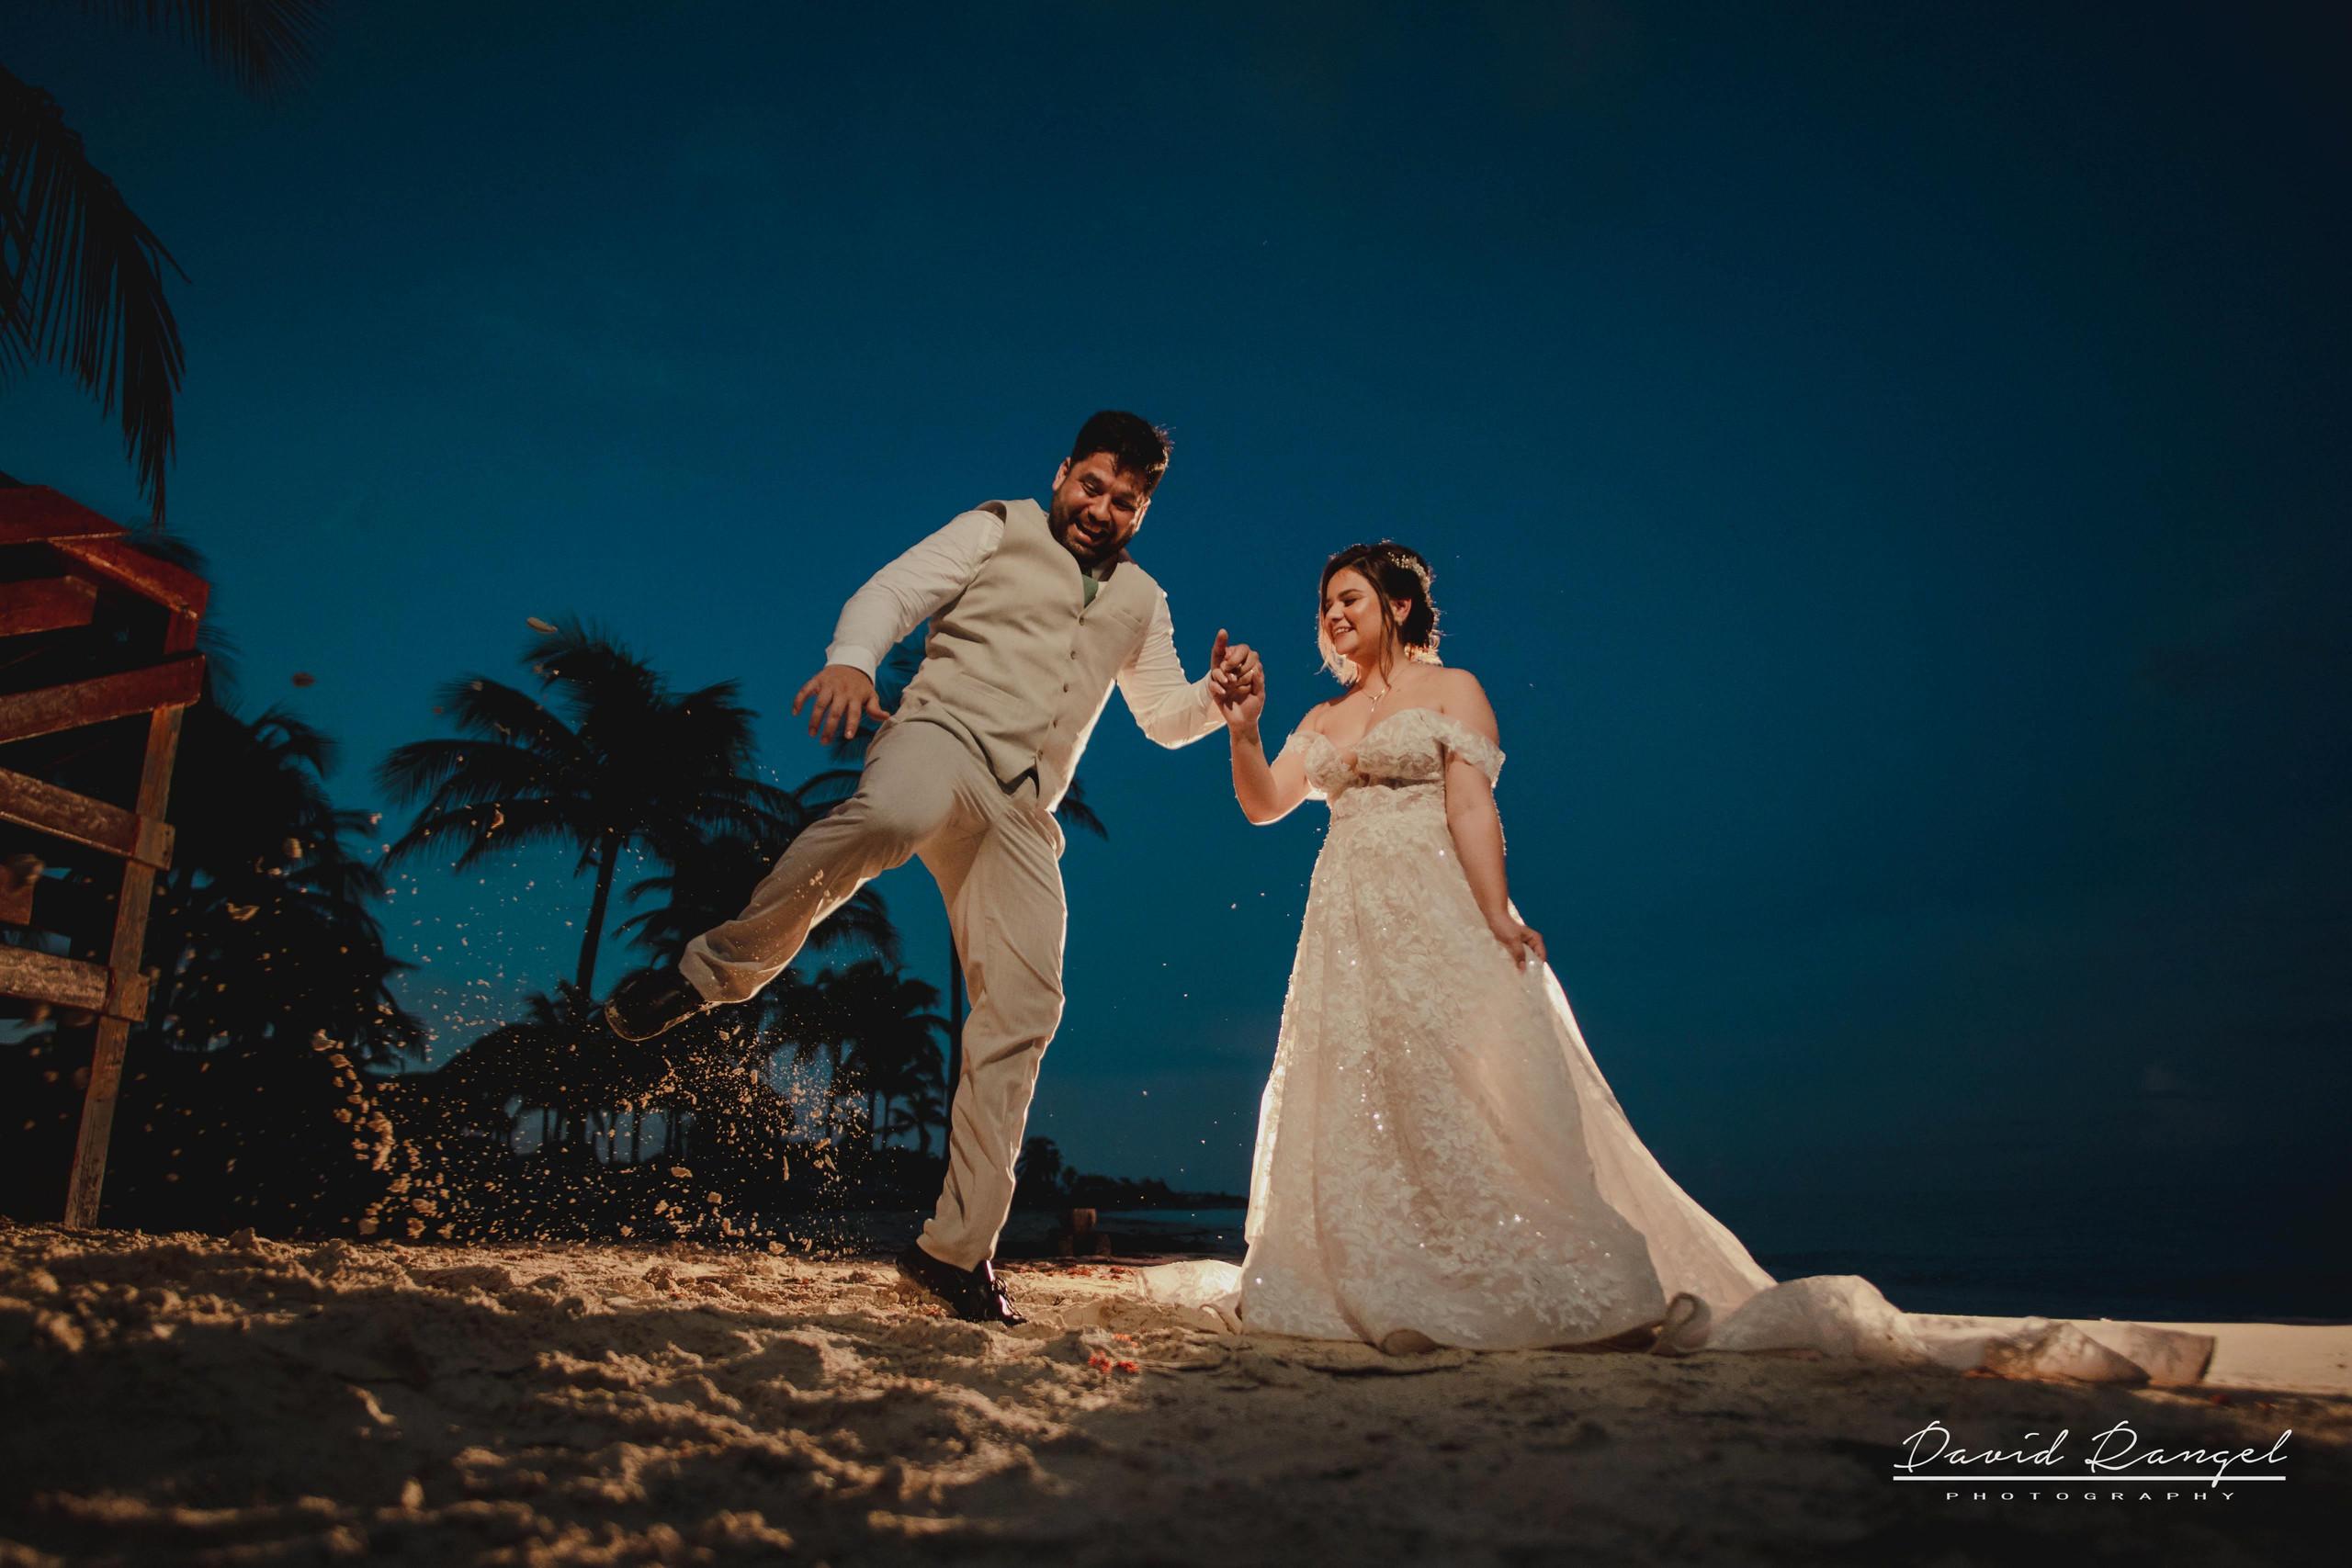 bride+groom+beach+sunset+session+happy+love+couple+celebration+wedding+photo+beach+caribean+sea+photographer+david+rangel+dress+suit+villa+chenera